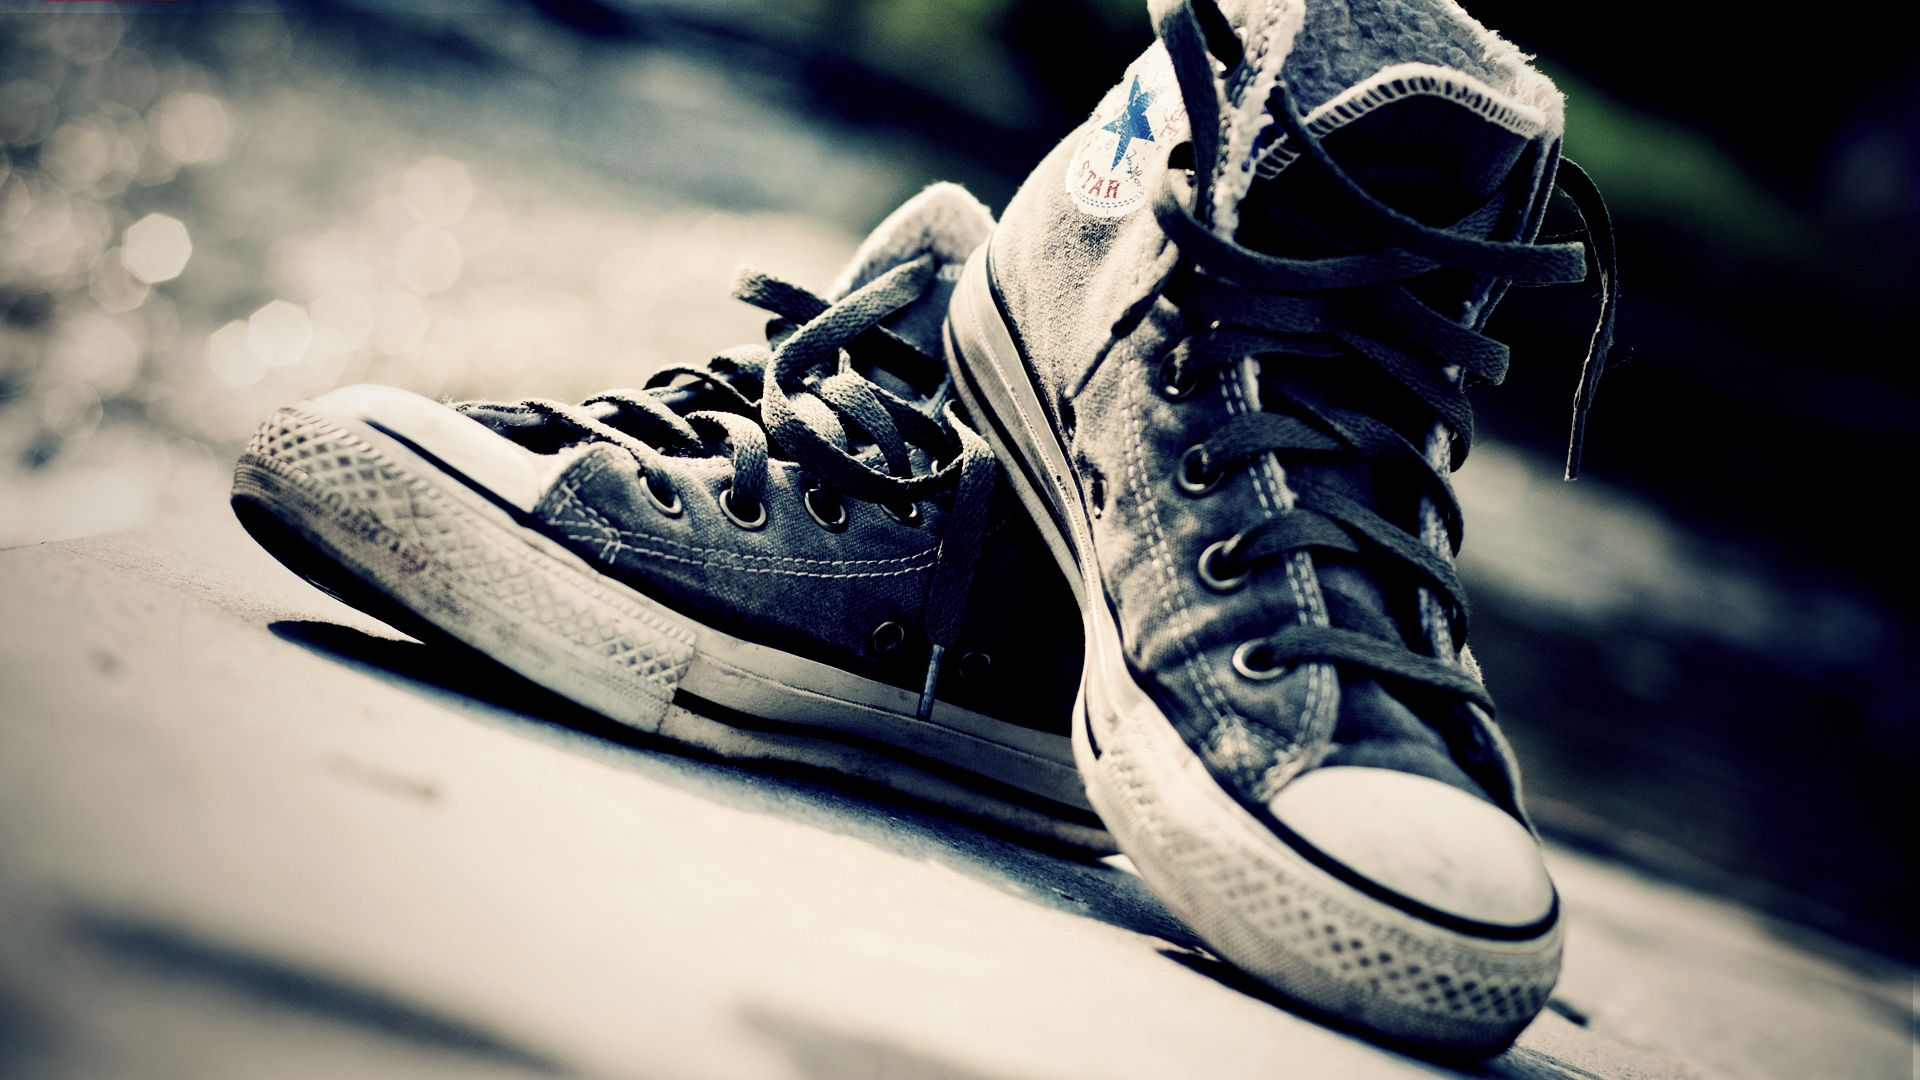 Converse Sneakers, Converse, Converse wallpaper